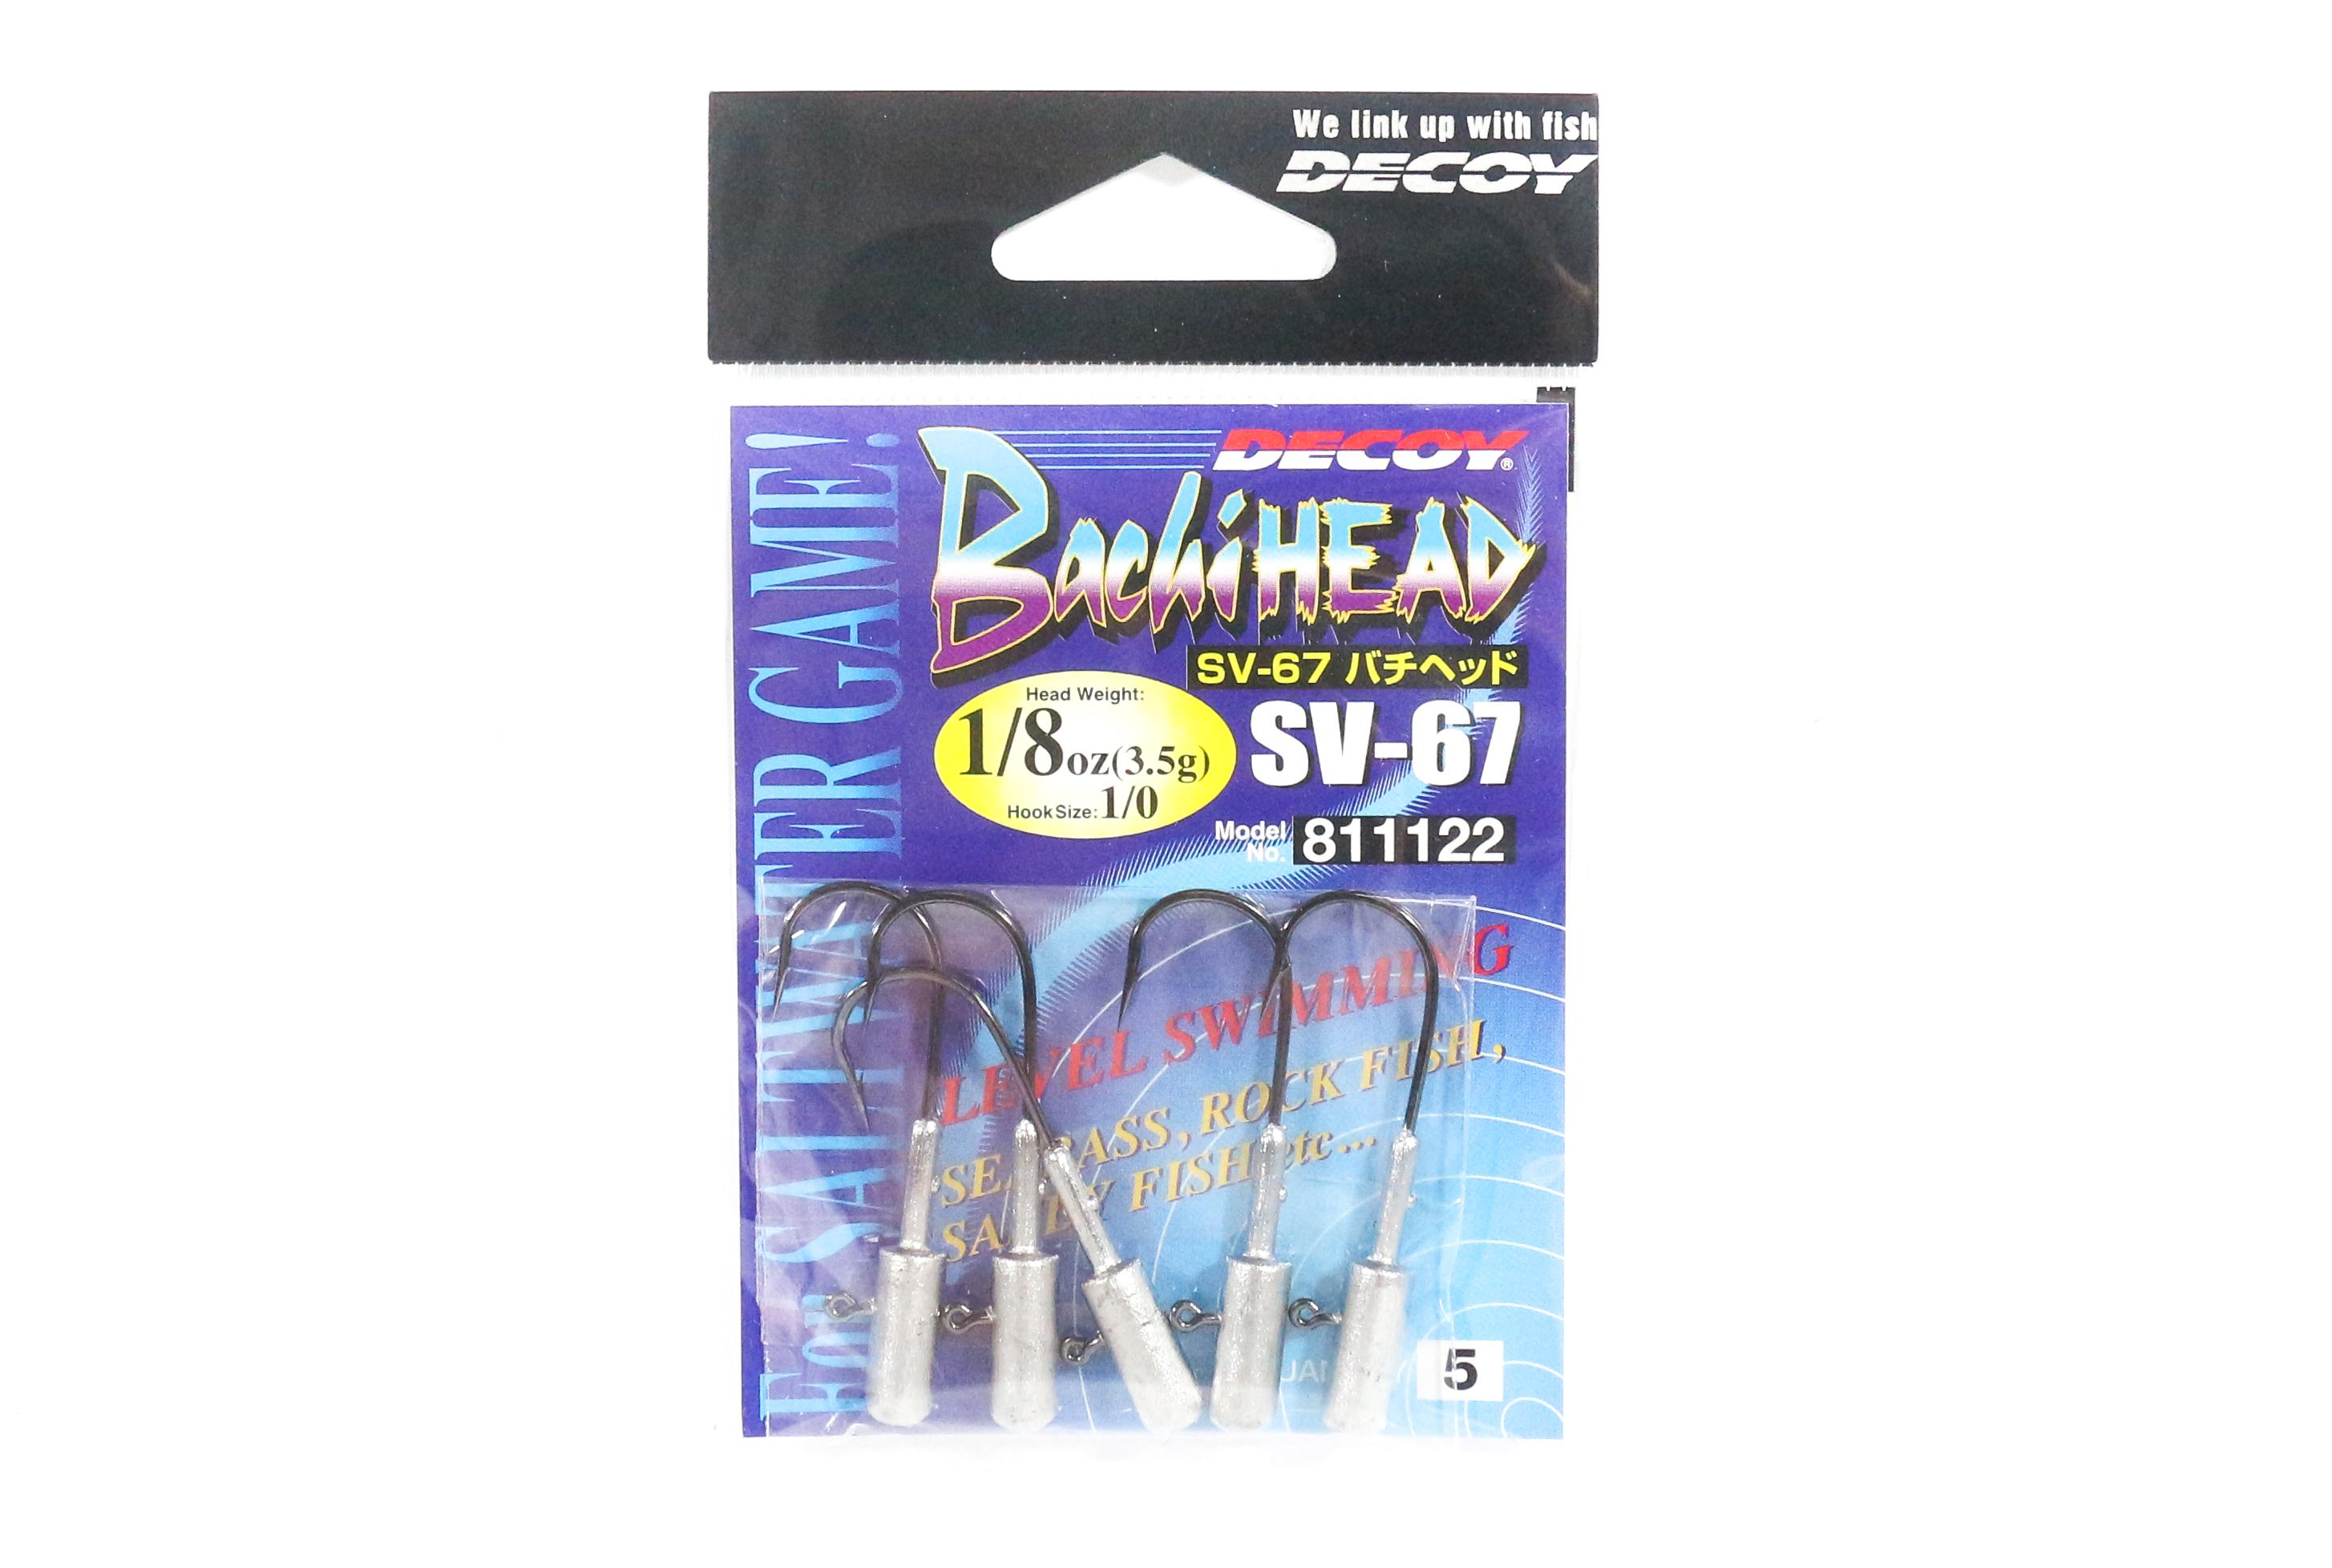 Decoy SV-67 Jig Head Bachi Head Heavy Duty Hook Size 1 3//32 oz 1115